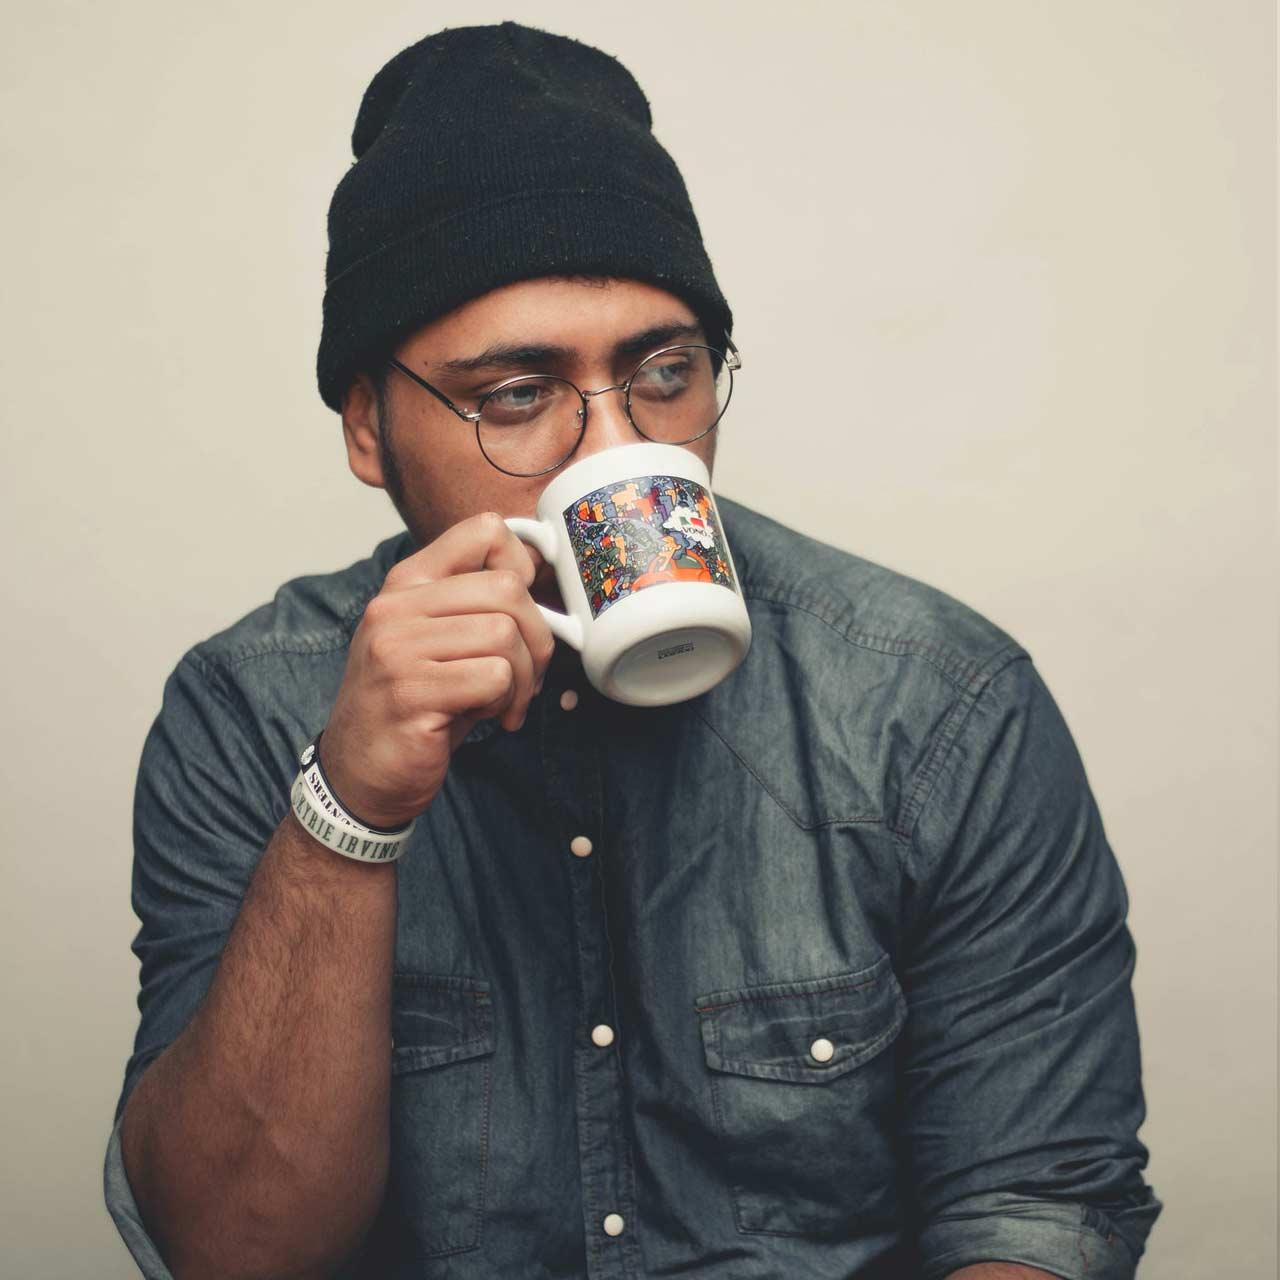 man-drinking-from-mug-2941565